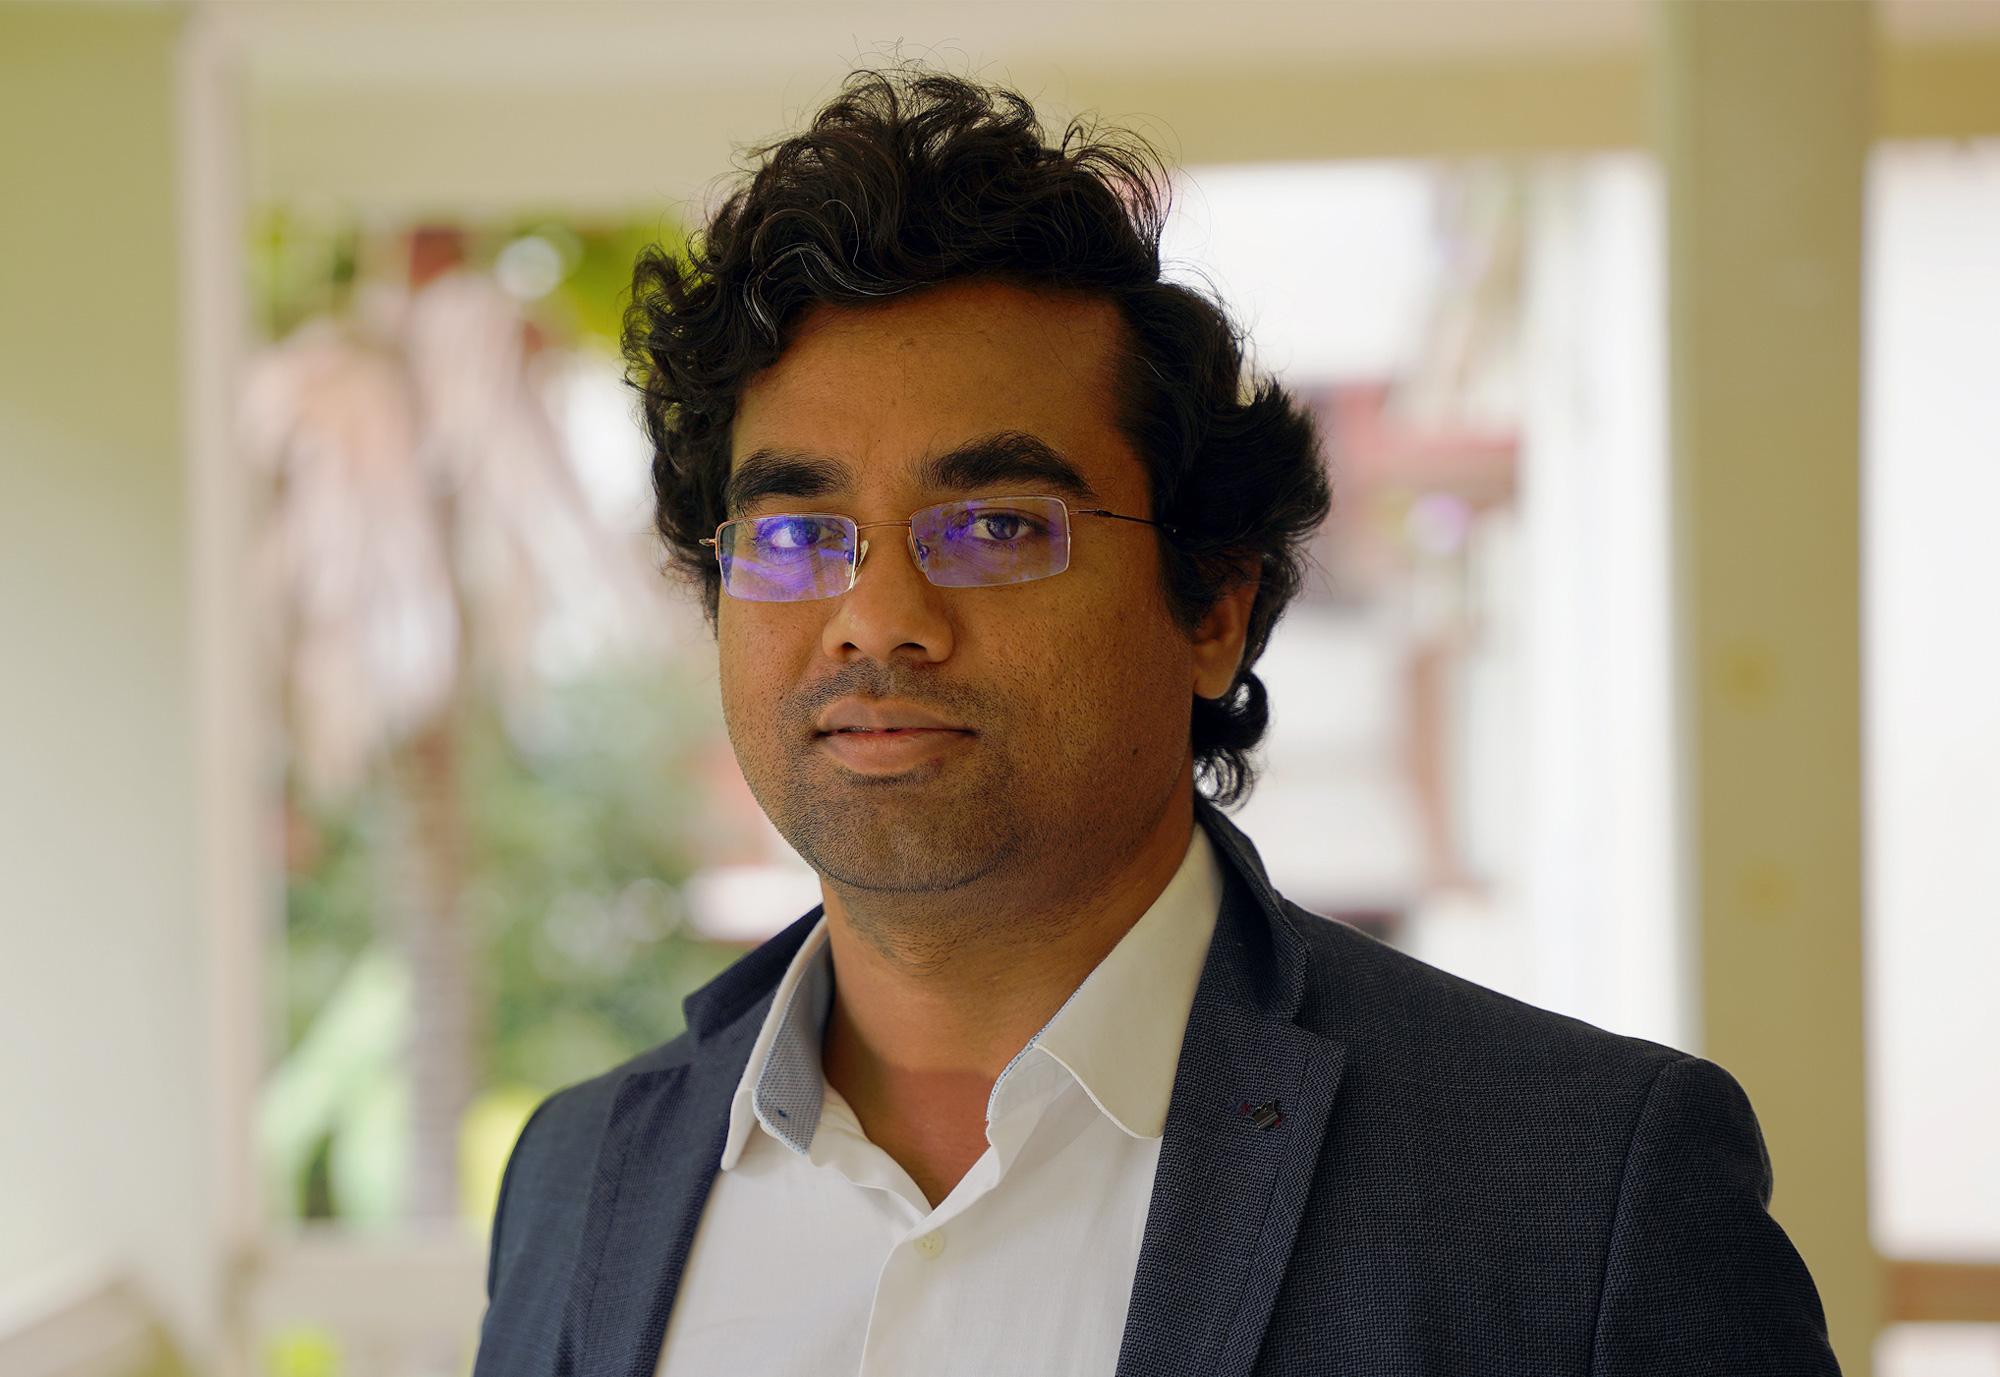 Photo of Mahesh Kakde in a suit jacket indoors